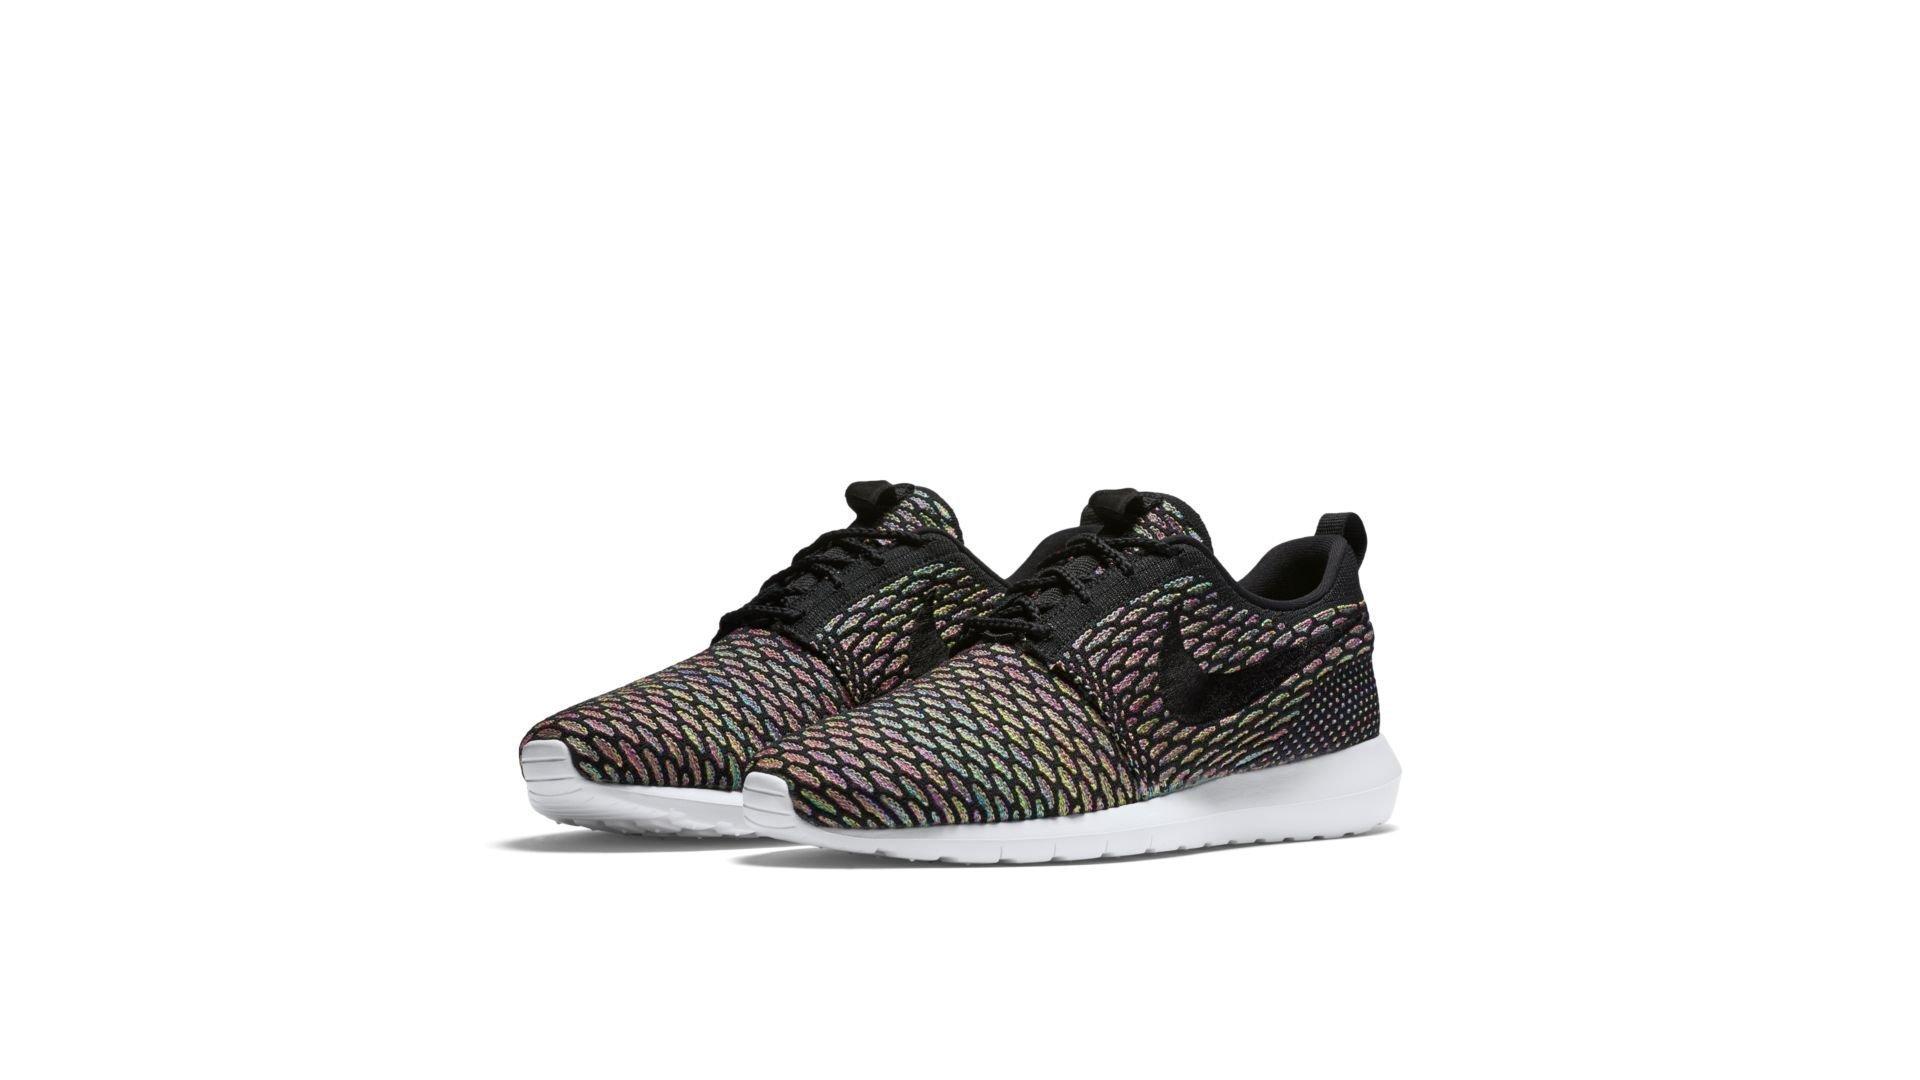 Nike Roshe Run Flyknit Multi-Color (677243-013)